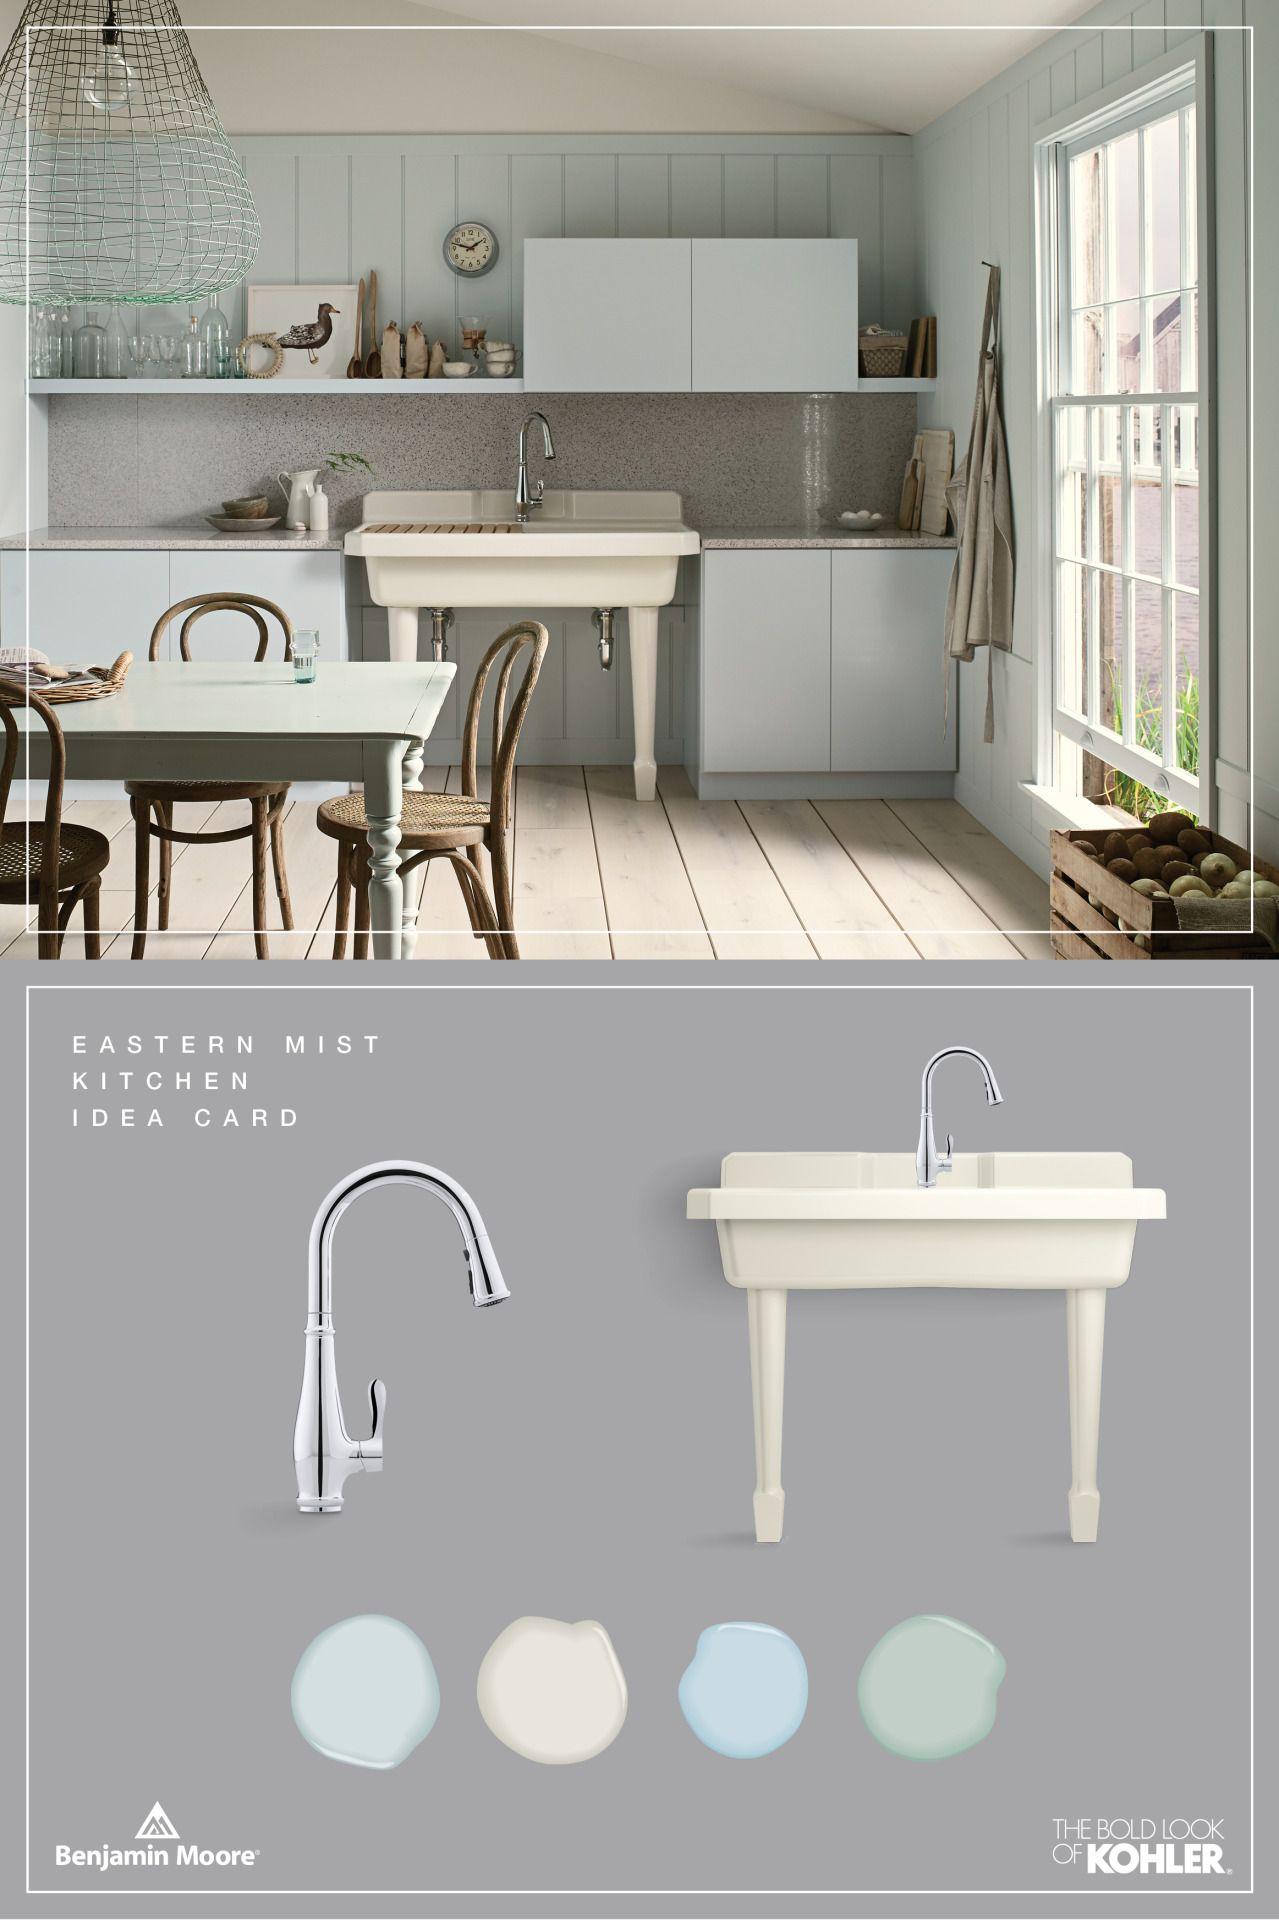 Benjamin moore palladian blue bathroom - Kohler Products Cruette Kitchen Faucet Harborview Utility Sink Benjamin Moore Paint Iceberg Cloud Cover Breath Of